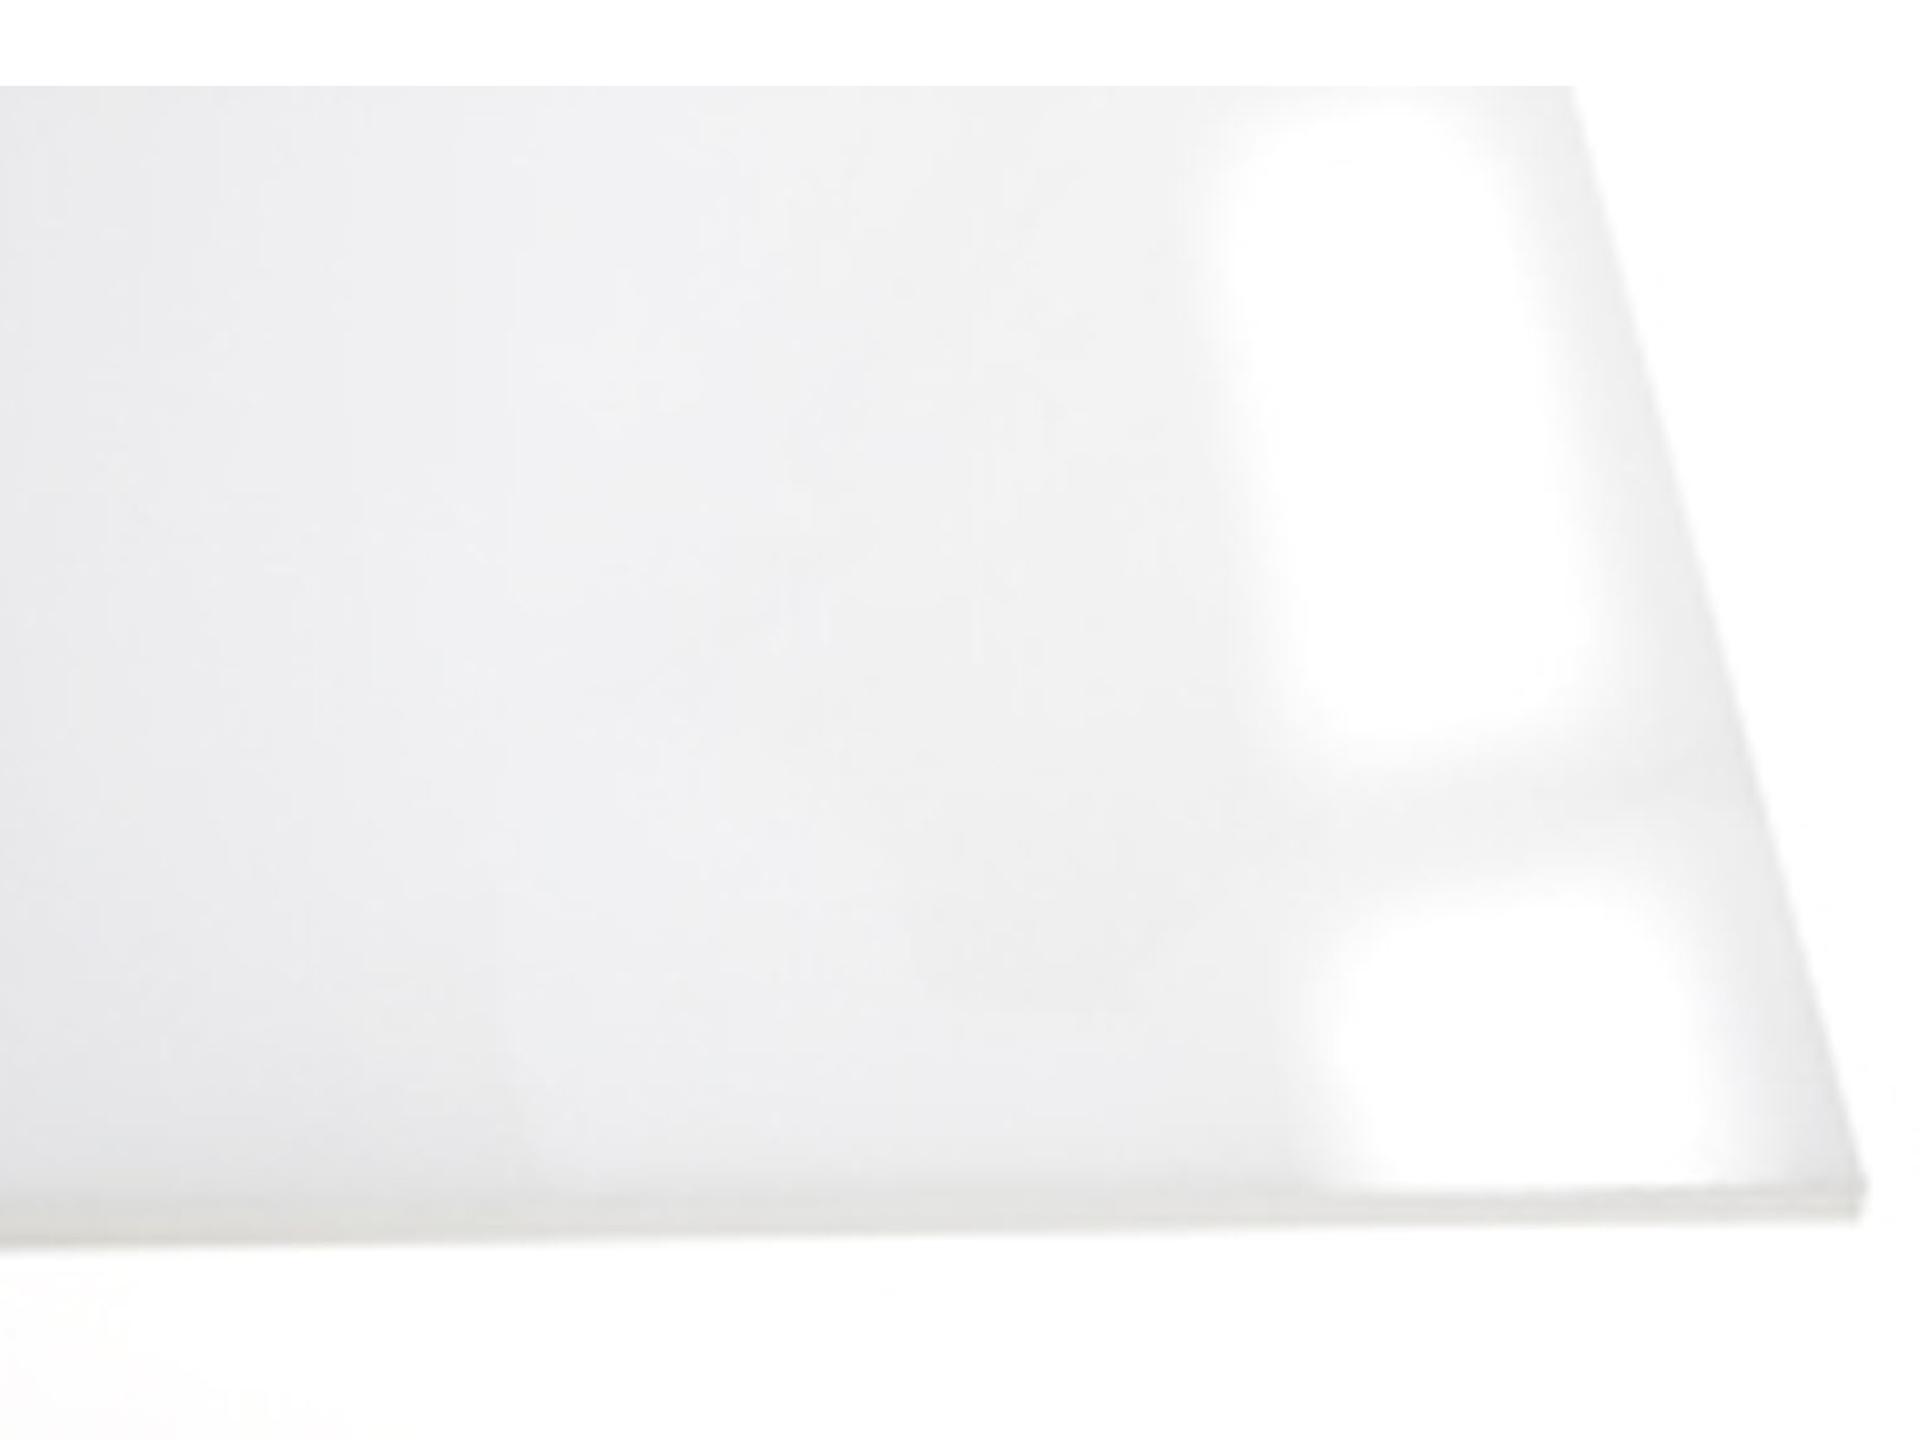 plaque plexiglass brico peinture de sol brico depot new plaque de parement brico depot trendy. Black Bedroom Furniture Sets. Home Design Ideas